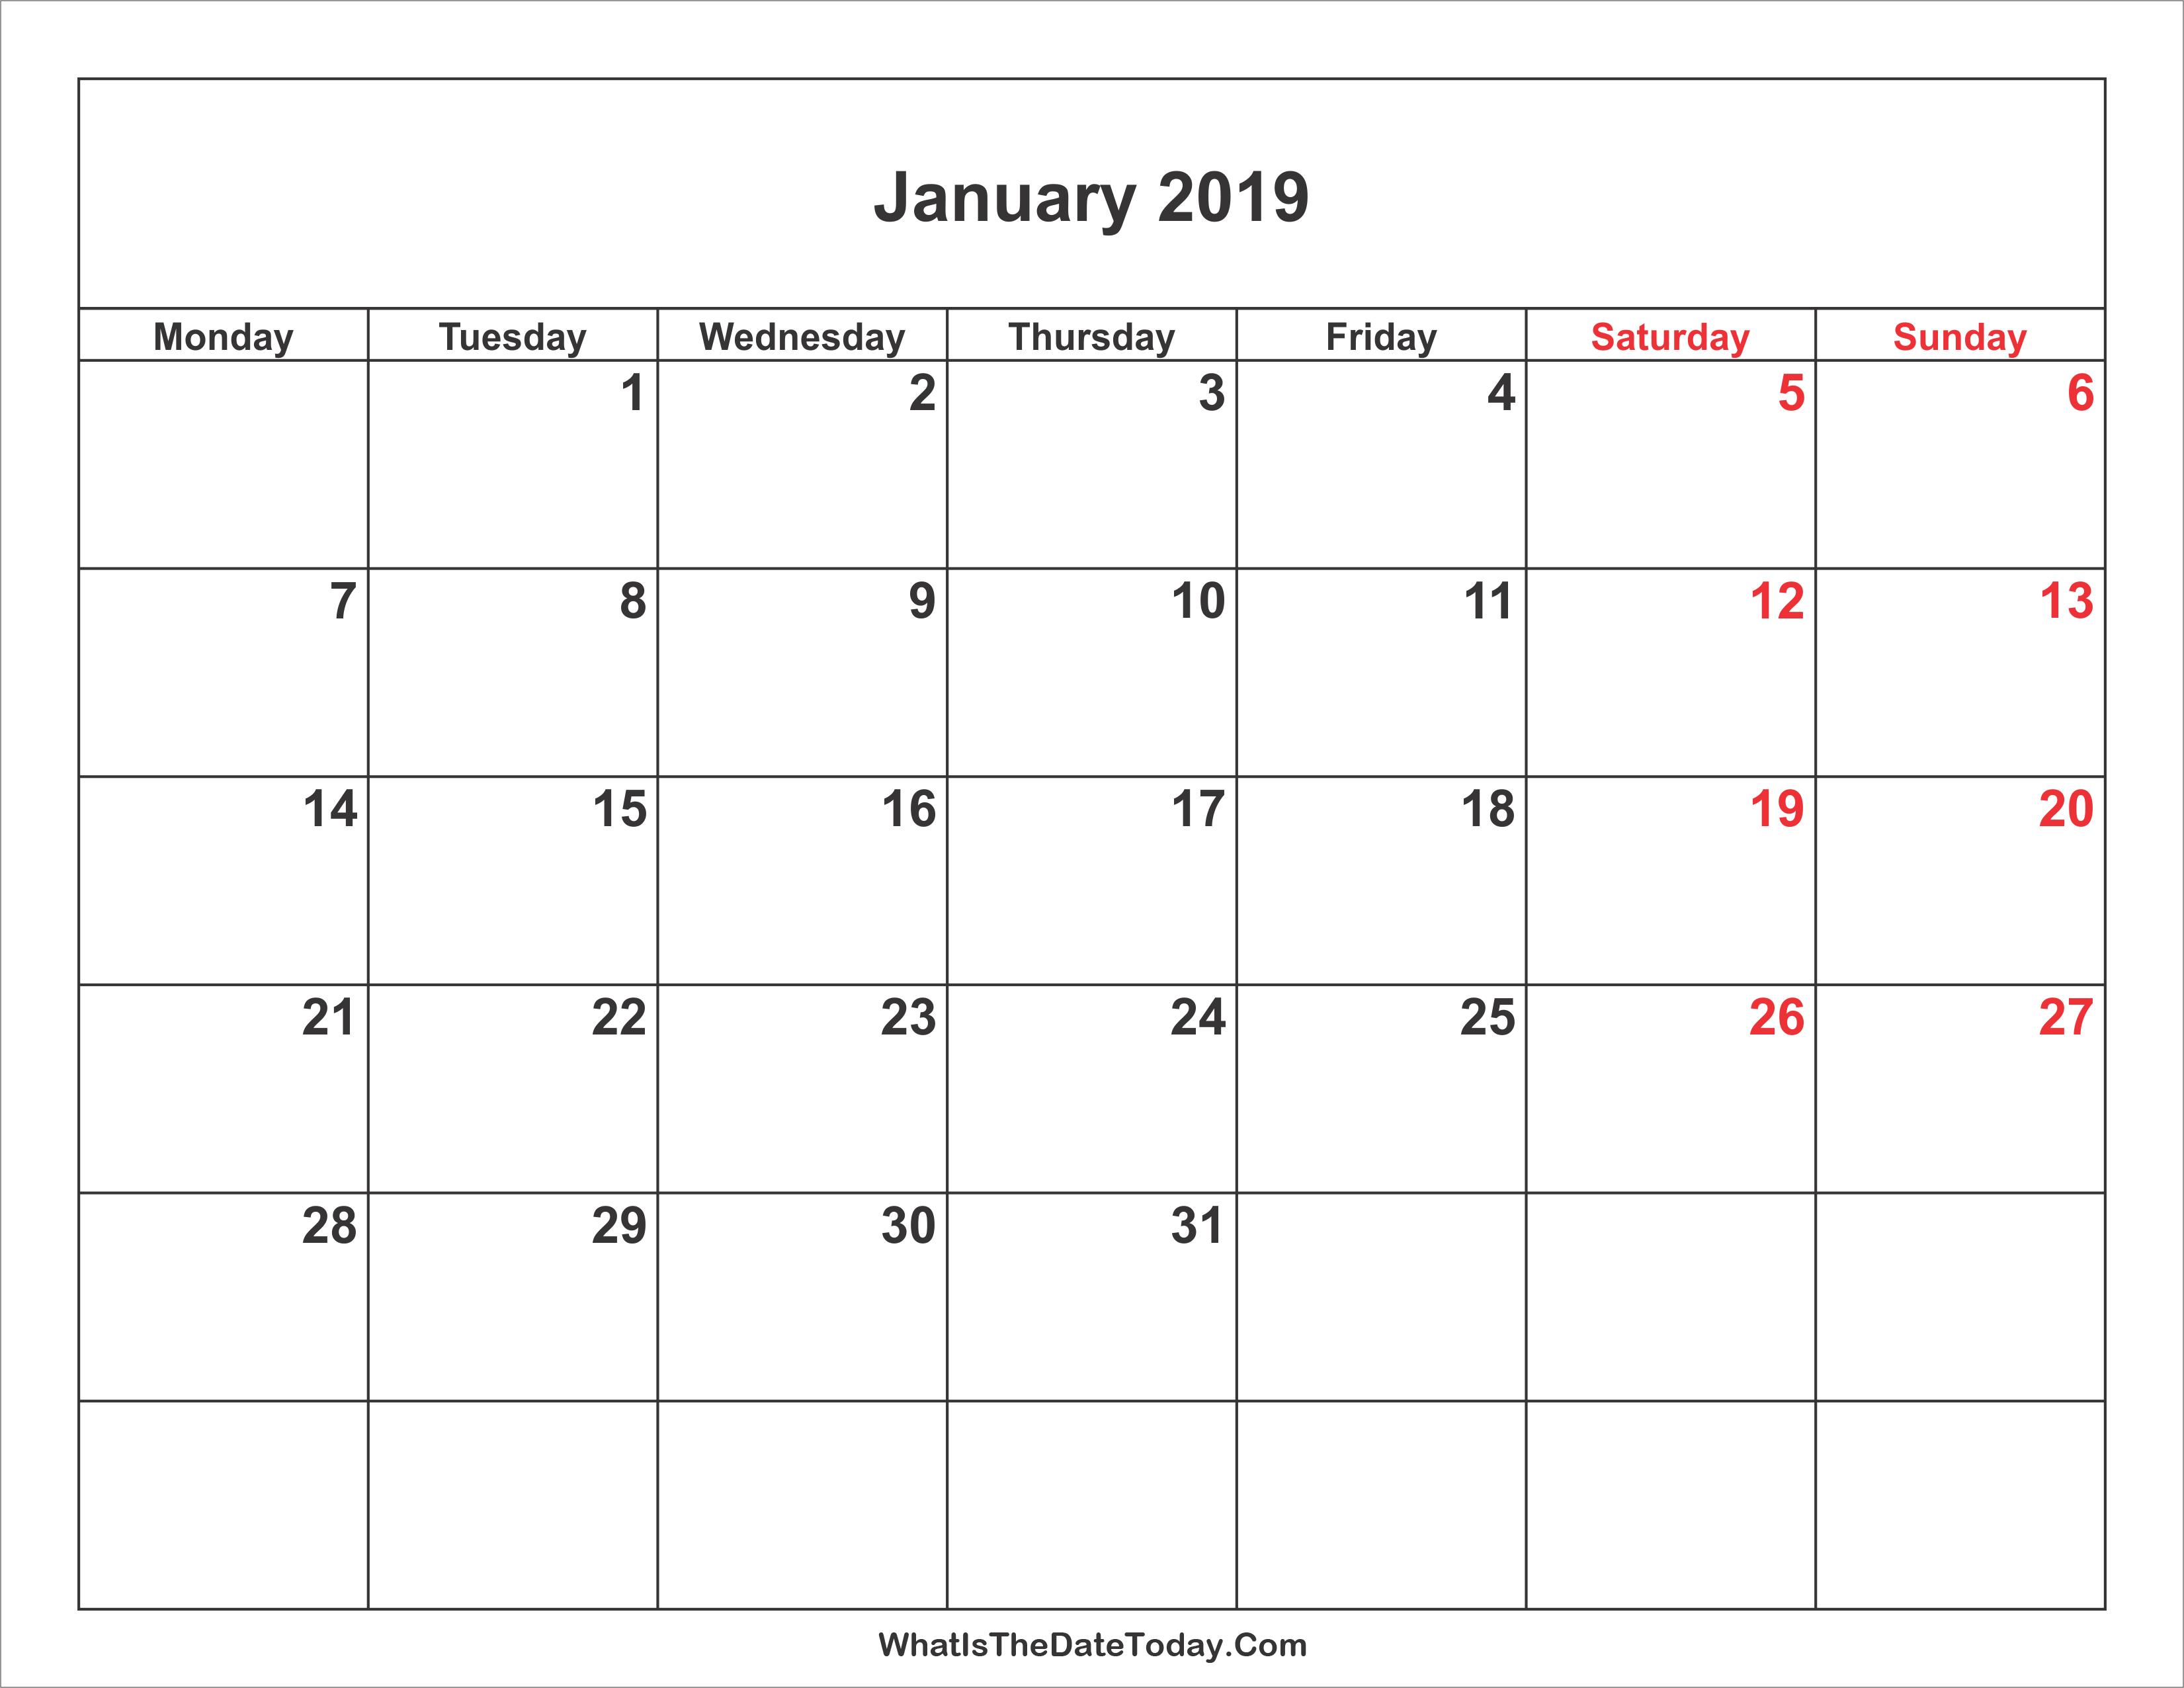 Weekend Calendar 2019 January 2019 Calendar with Weekend Highlight | Whatisthedatetoday.Com